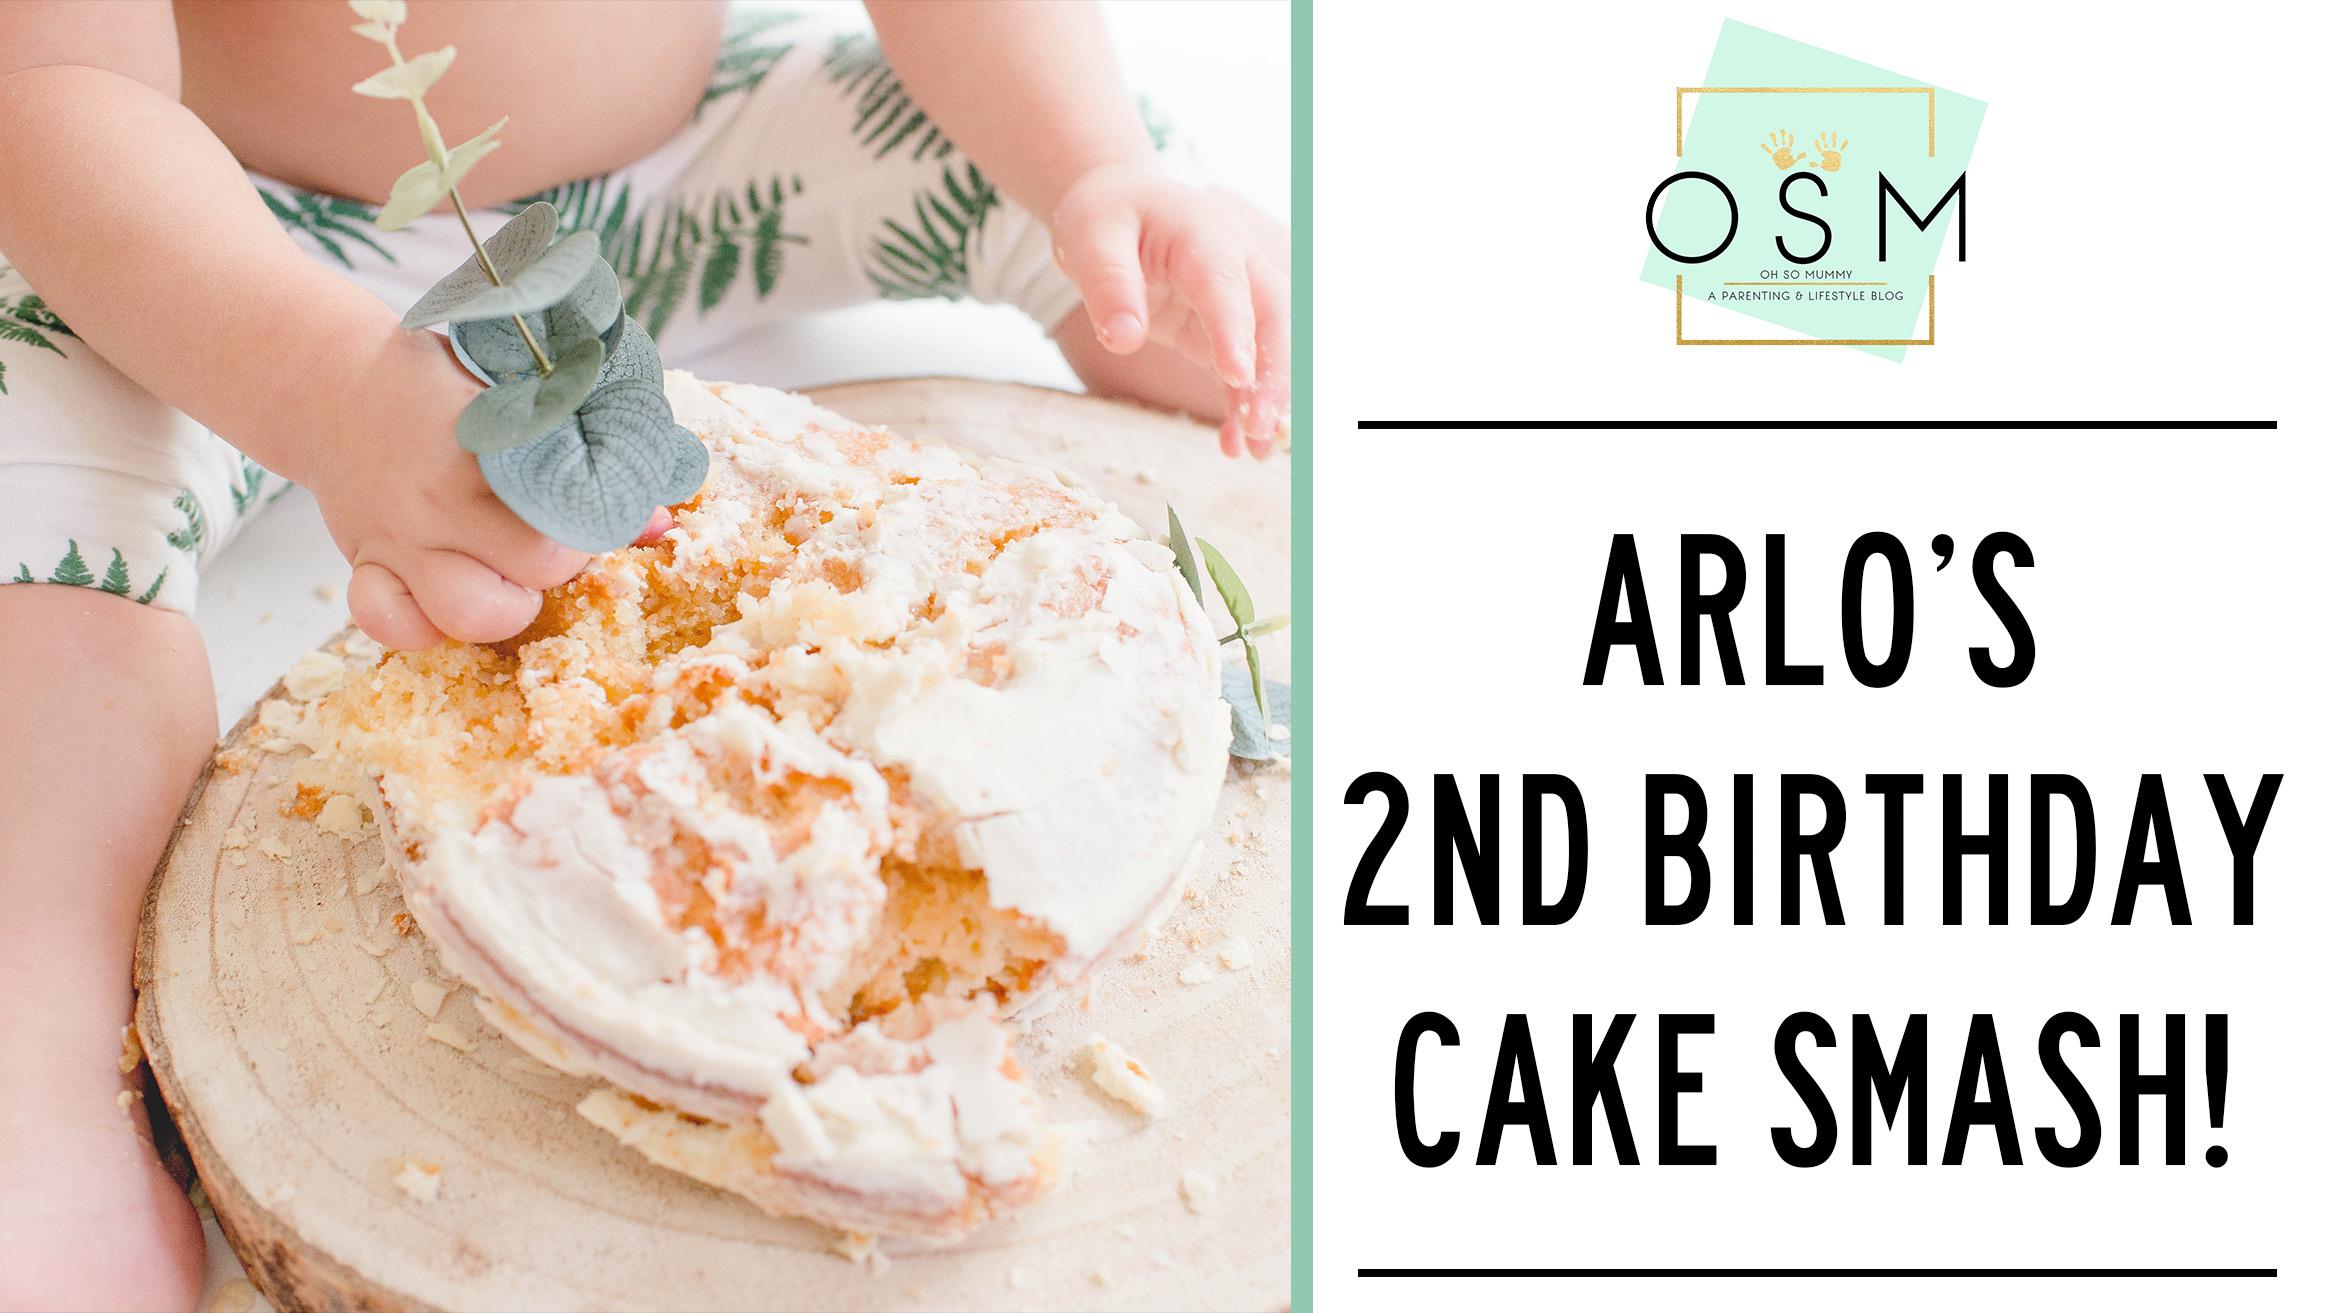 Admirable Arlos 2Nd Birthday Cake Smash Oh So Mummy Funny Birthday Cards Online Hetedamsfinfo